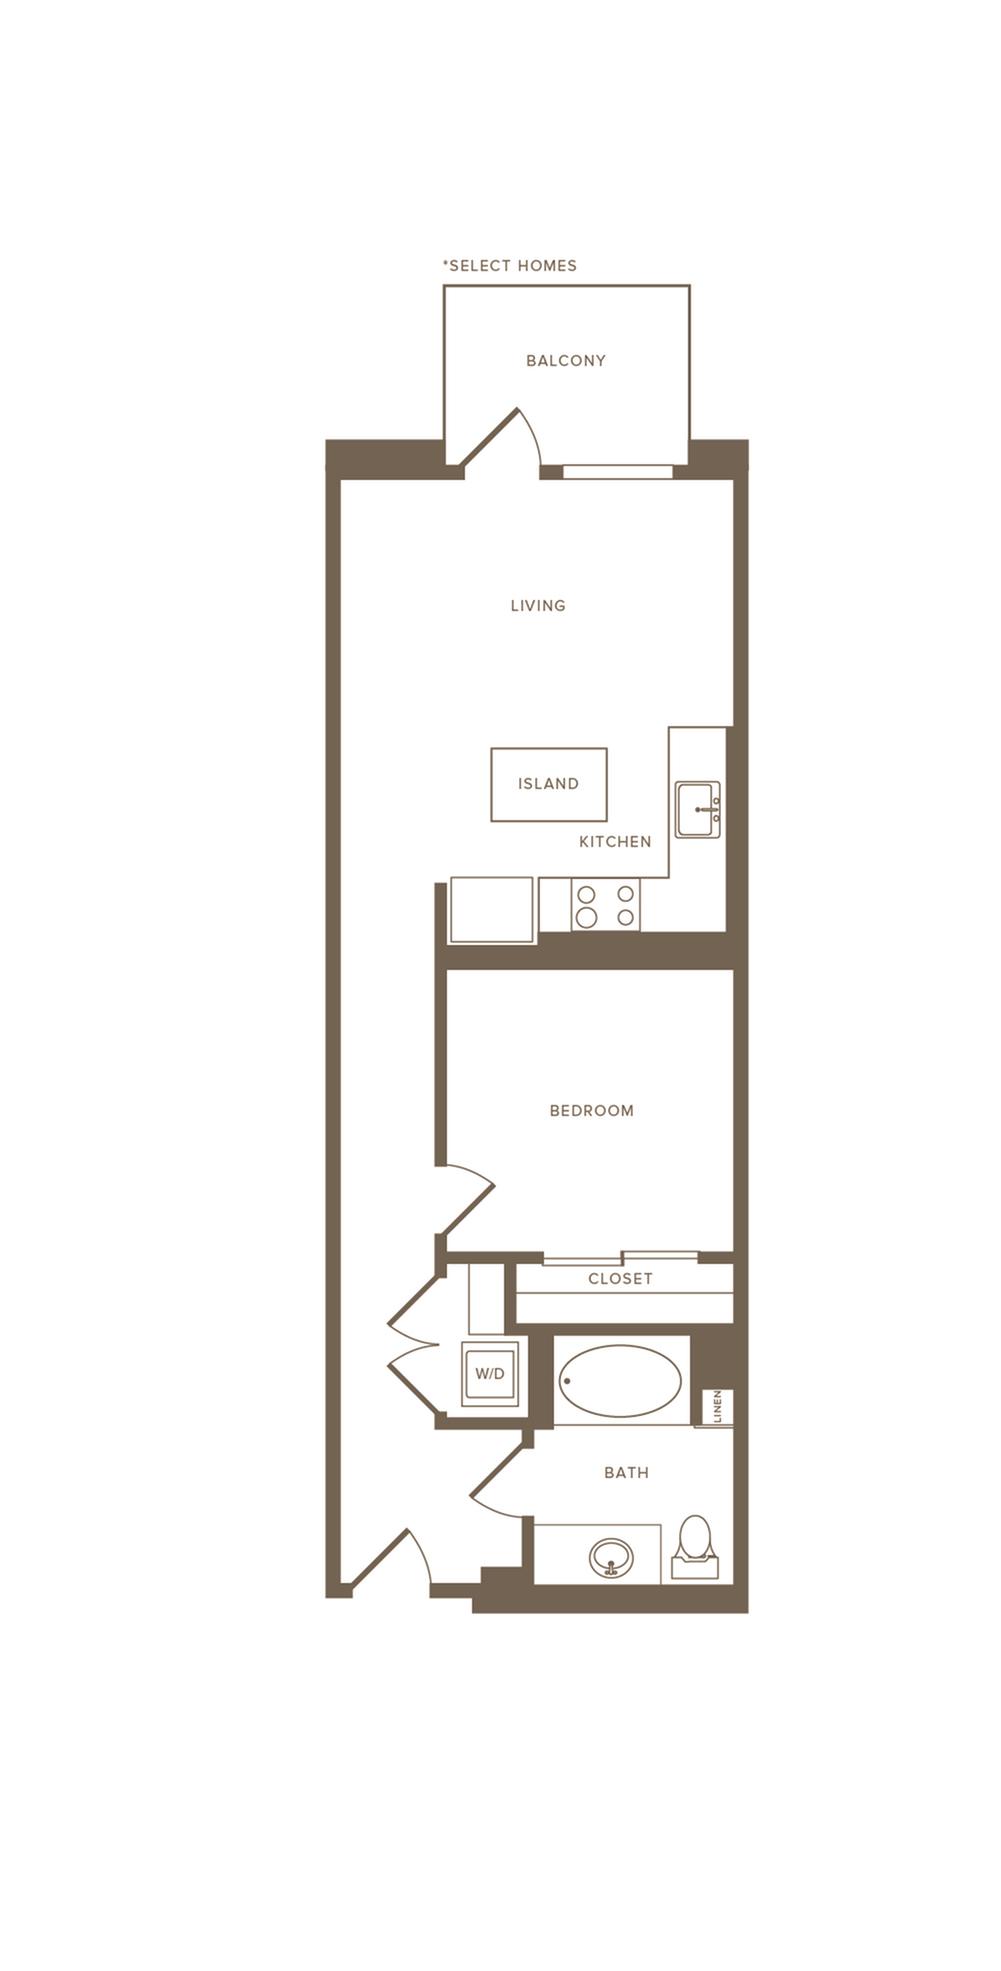 630-675 square foot one bedroom one bath floor plan image